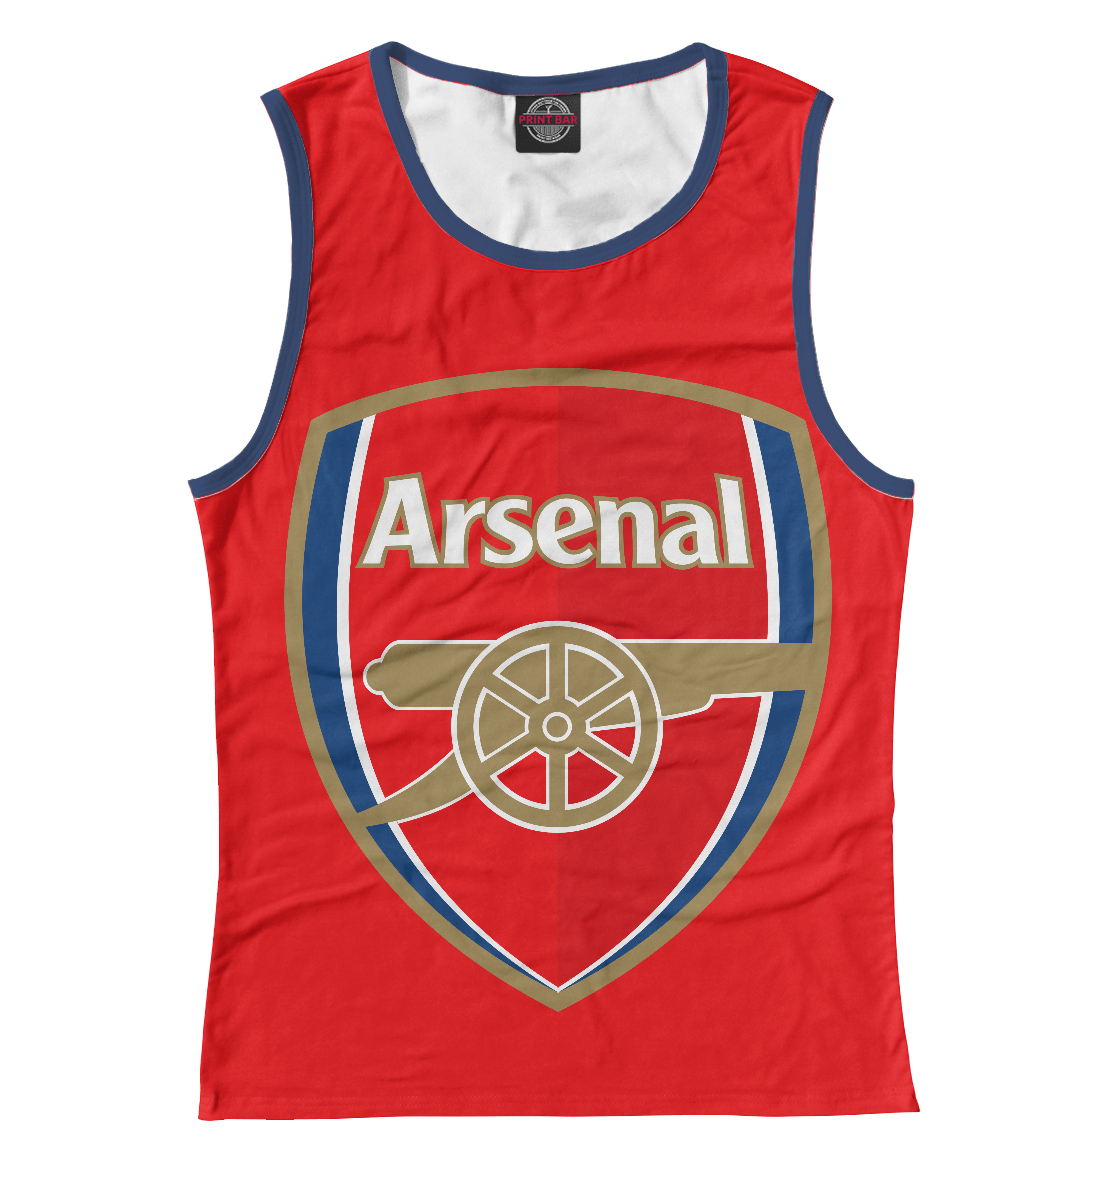 Купить Арсенал, Printbar, Майки, ARS-918476-may-1